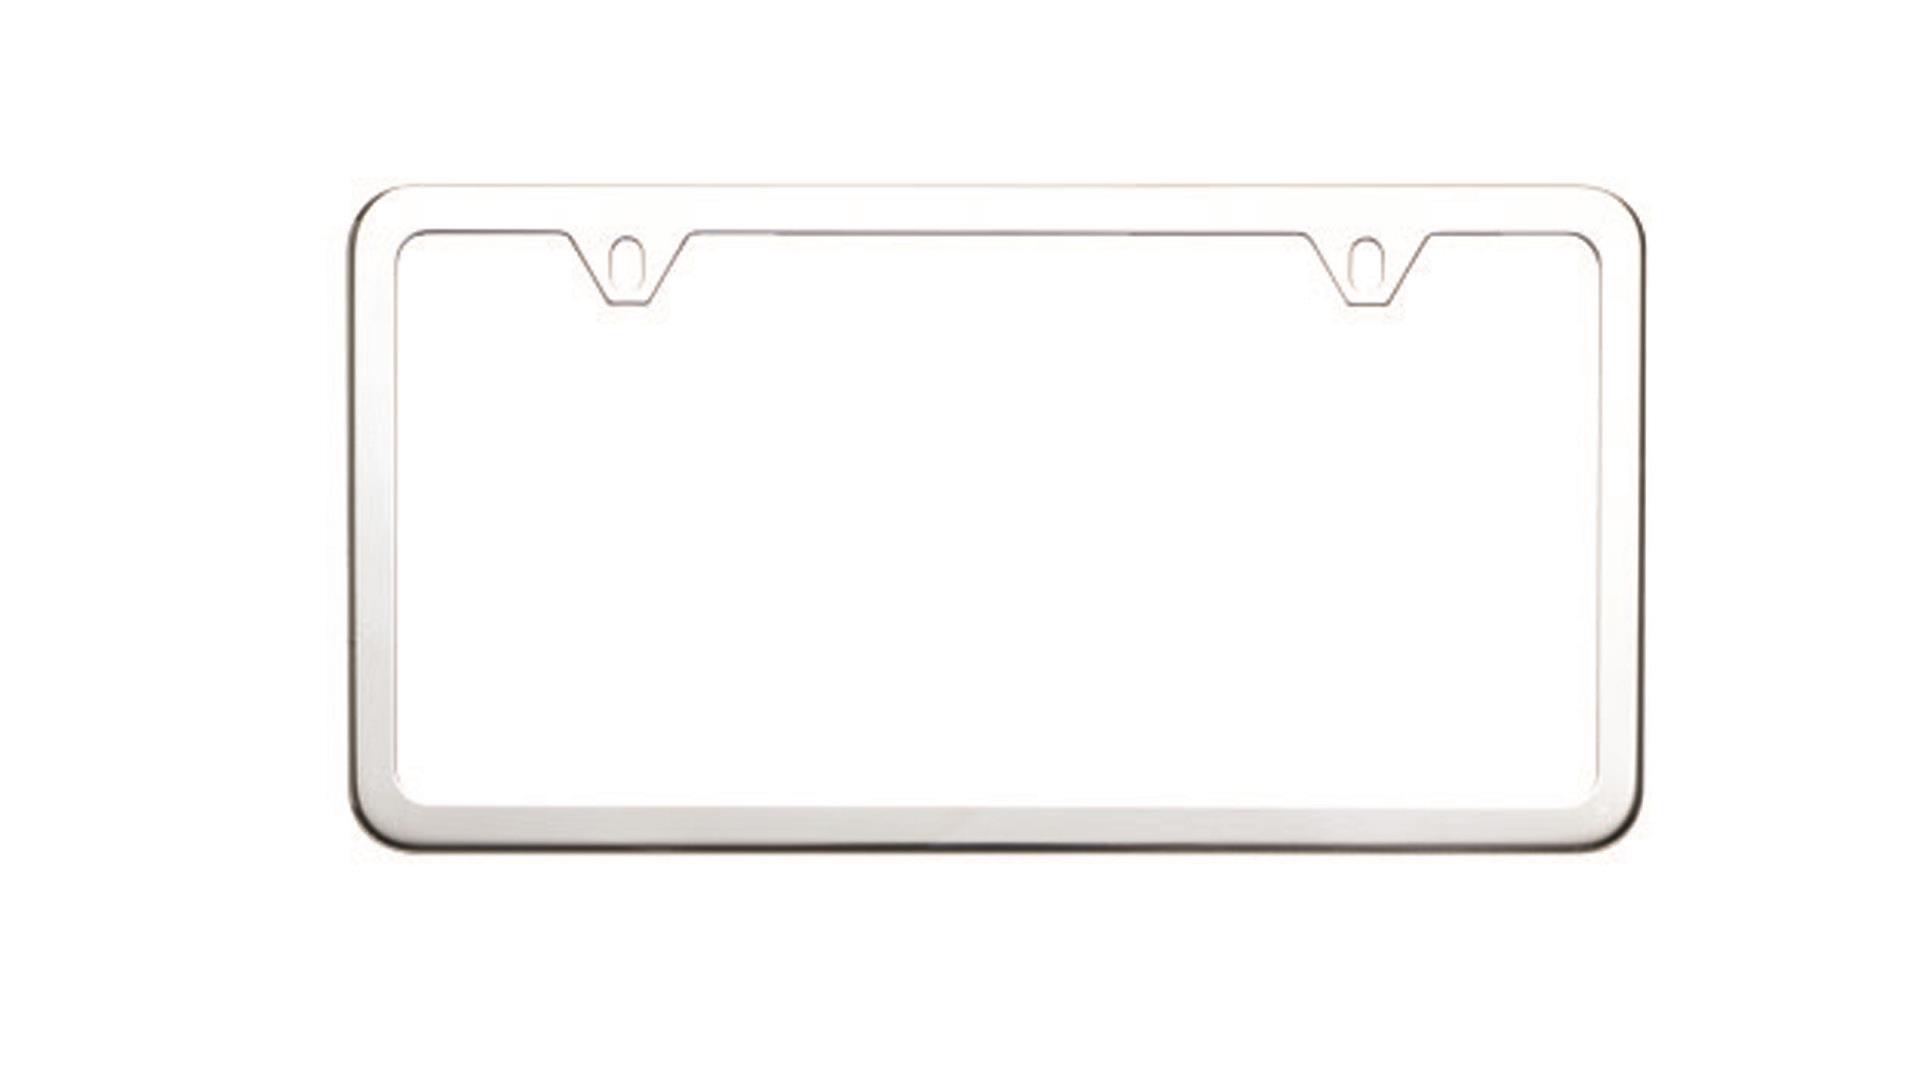 2012 Subaru Forester License Plate Frame, Slim Line